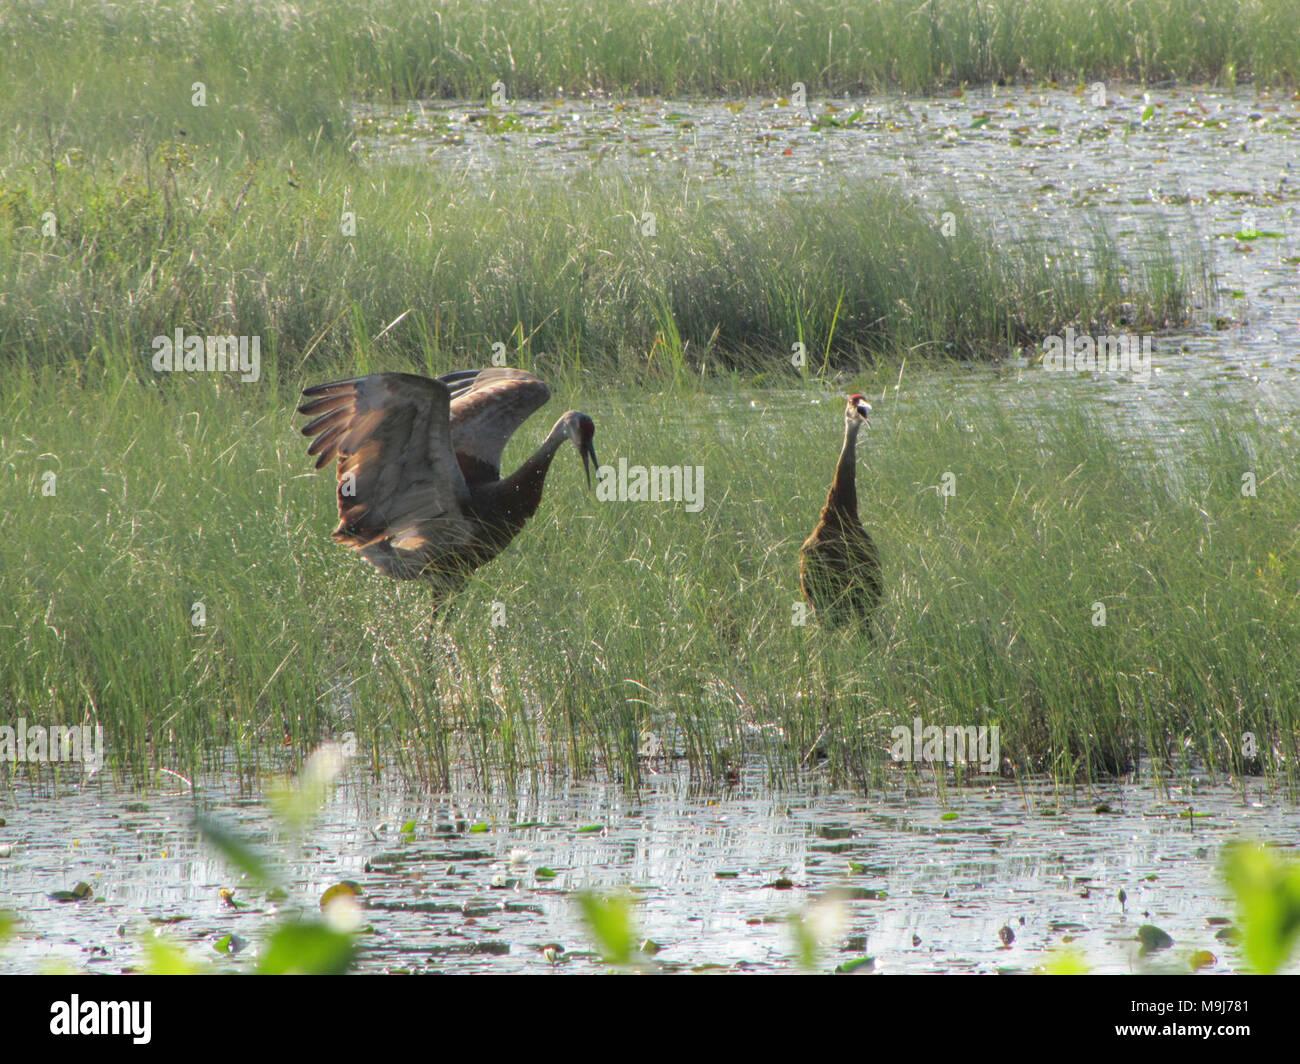 Sandhill Crane National Wildlife Federation >> Dancing Sandhill Cranes At Seney National Wildlife Refuge Photo By